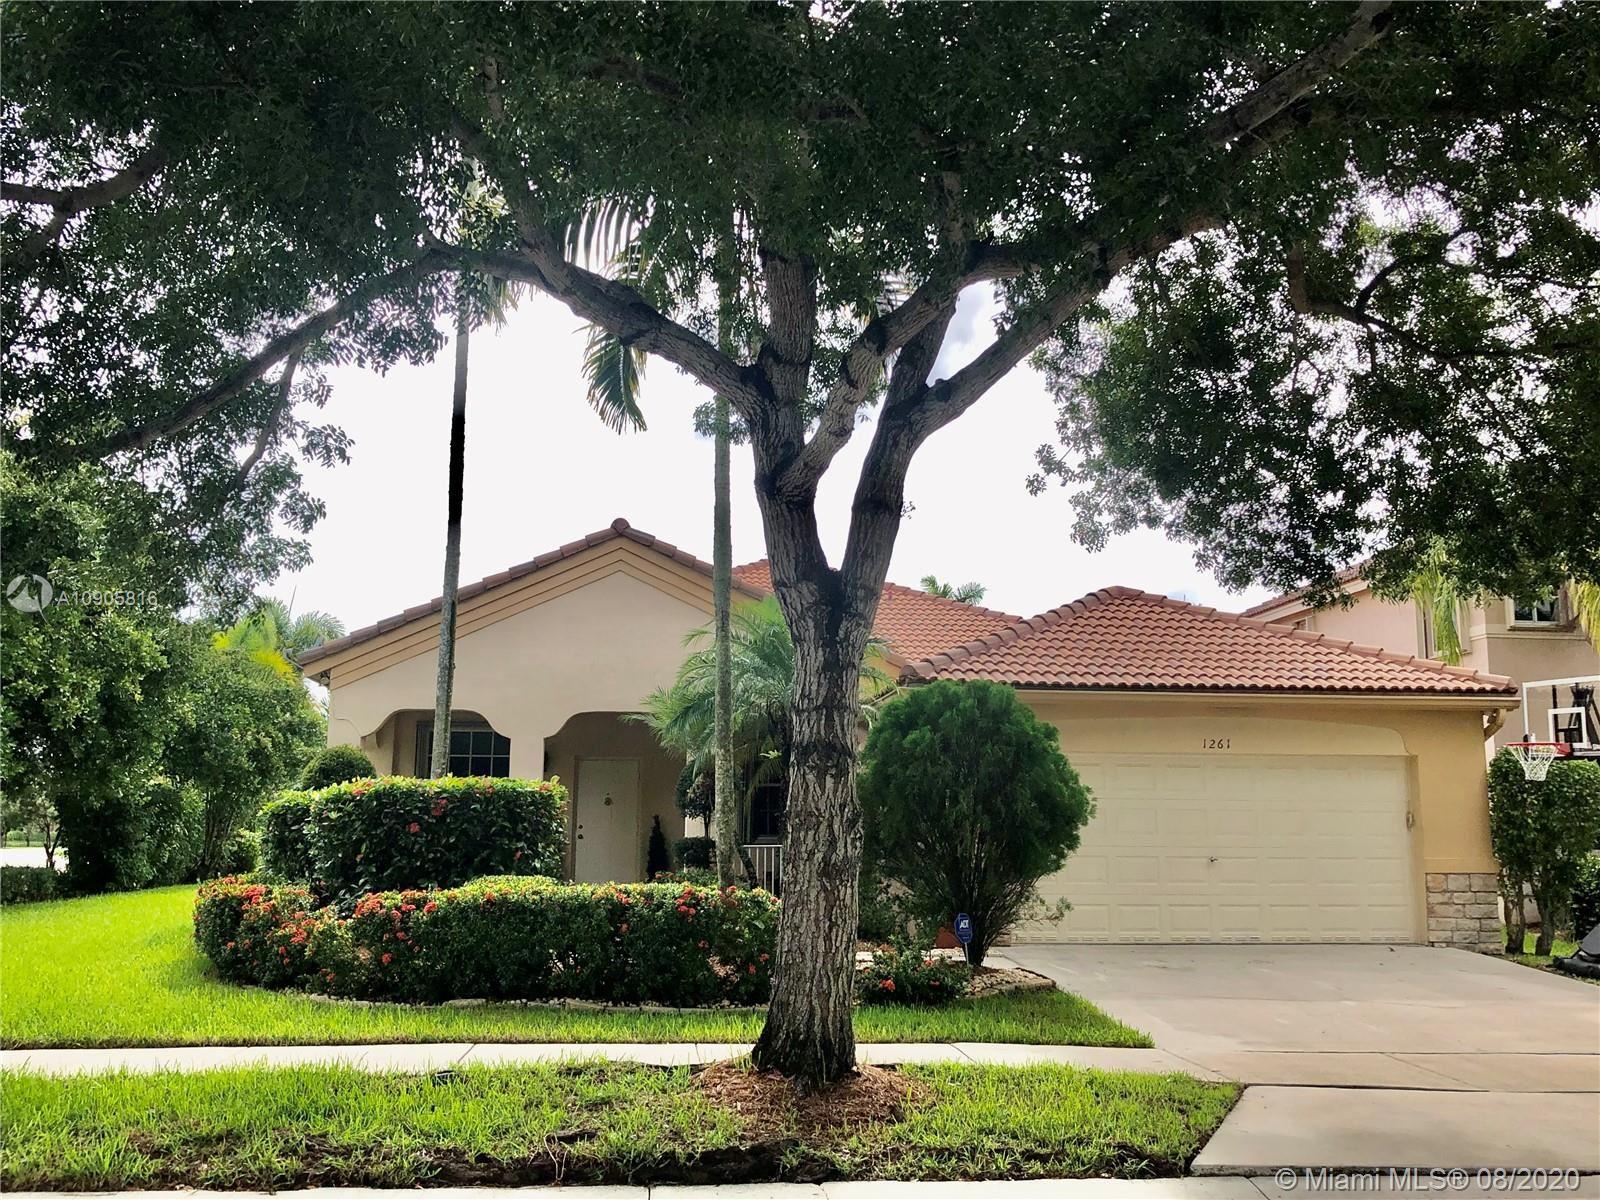 1261 Allamanda Way, Weston, FL 33327 - #: A10905816